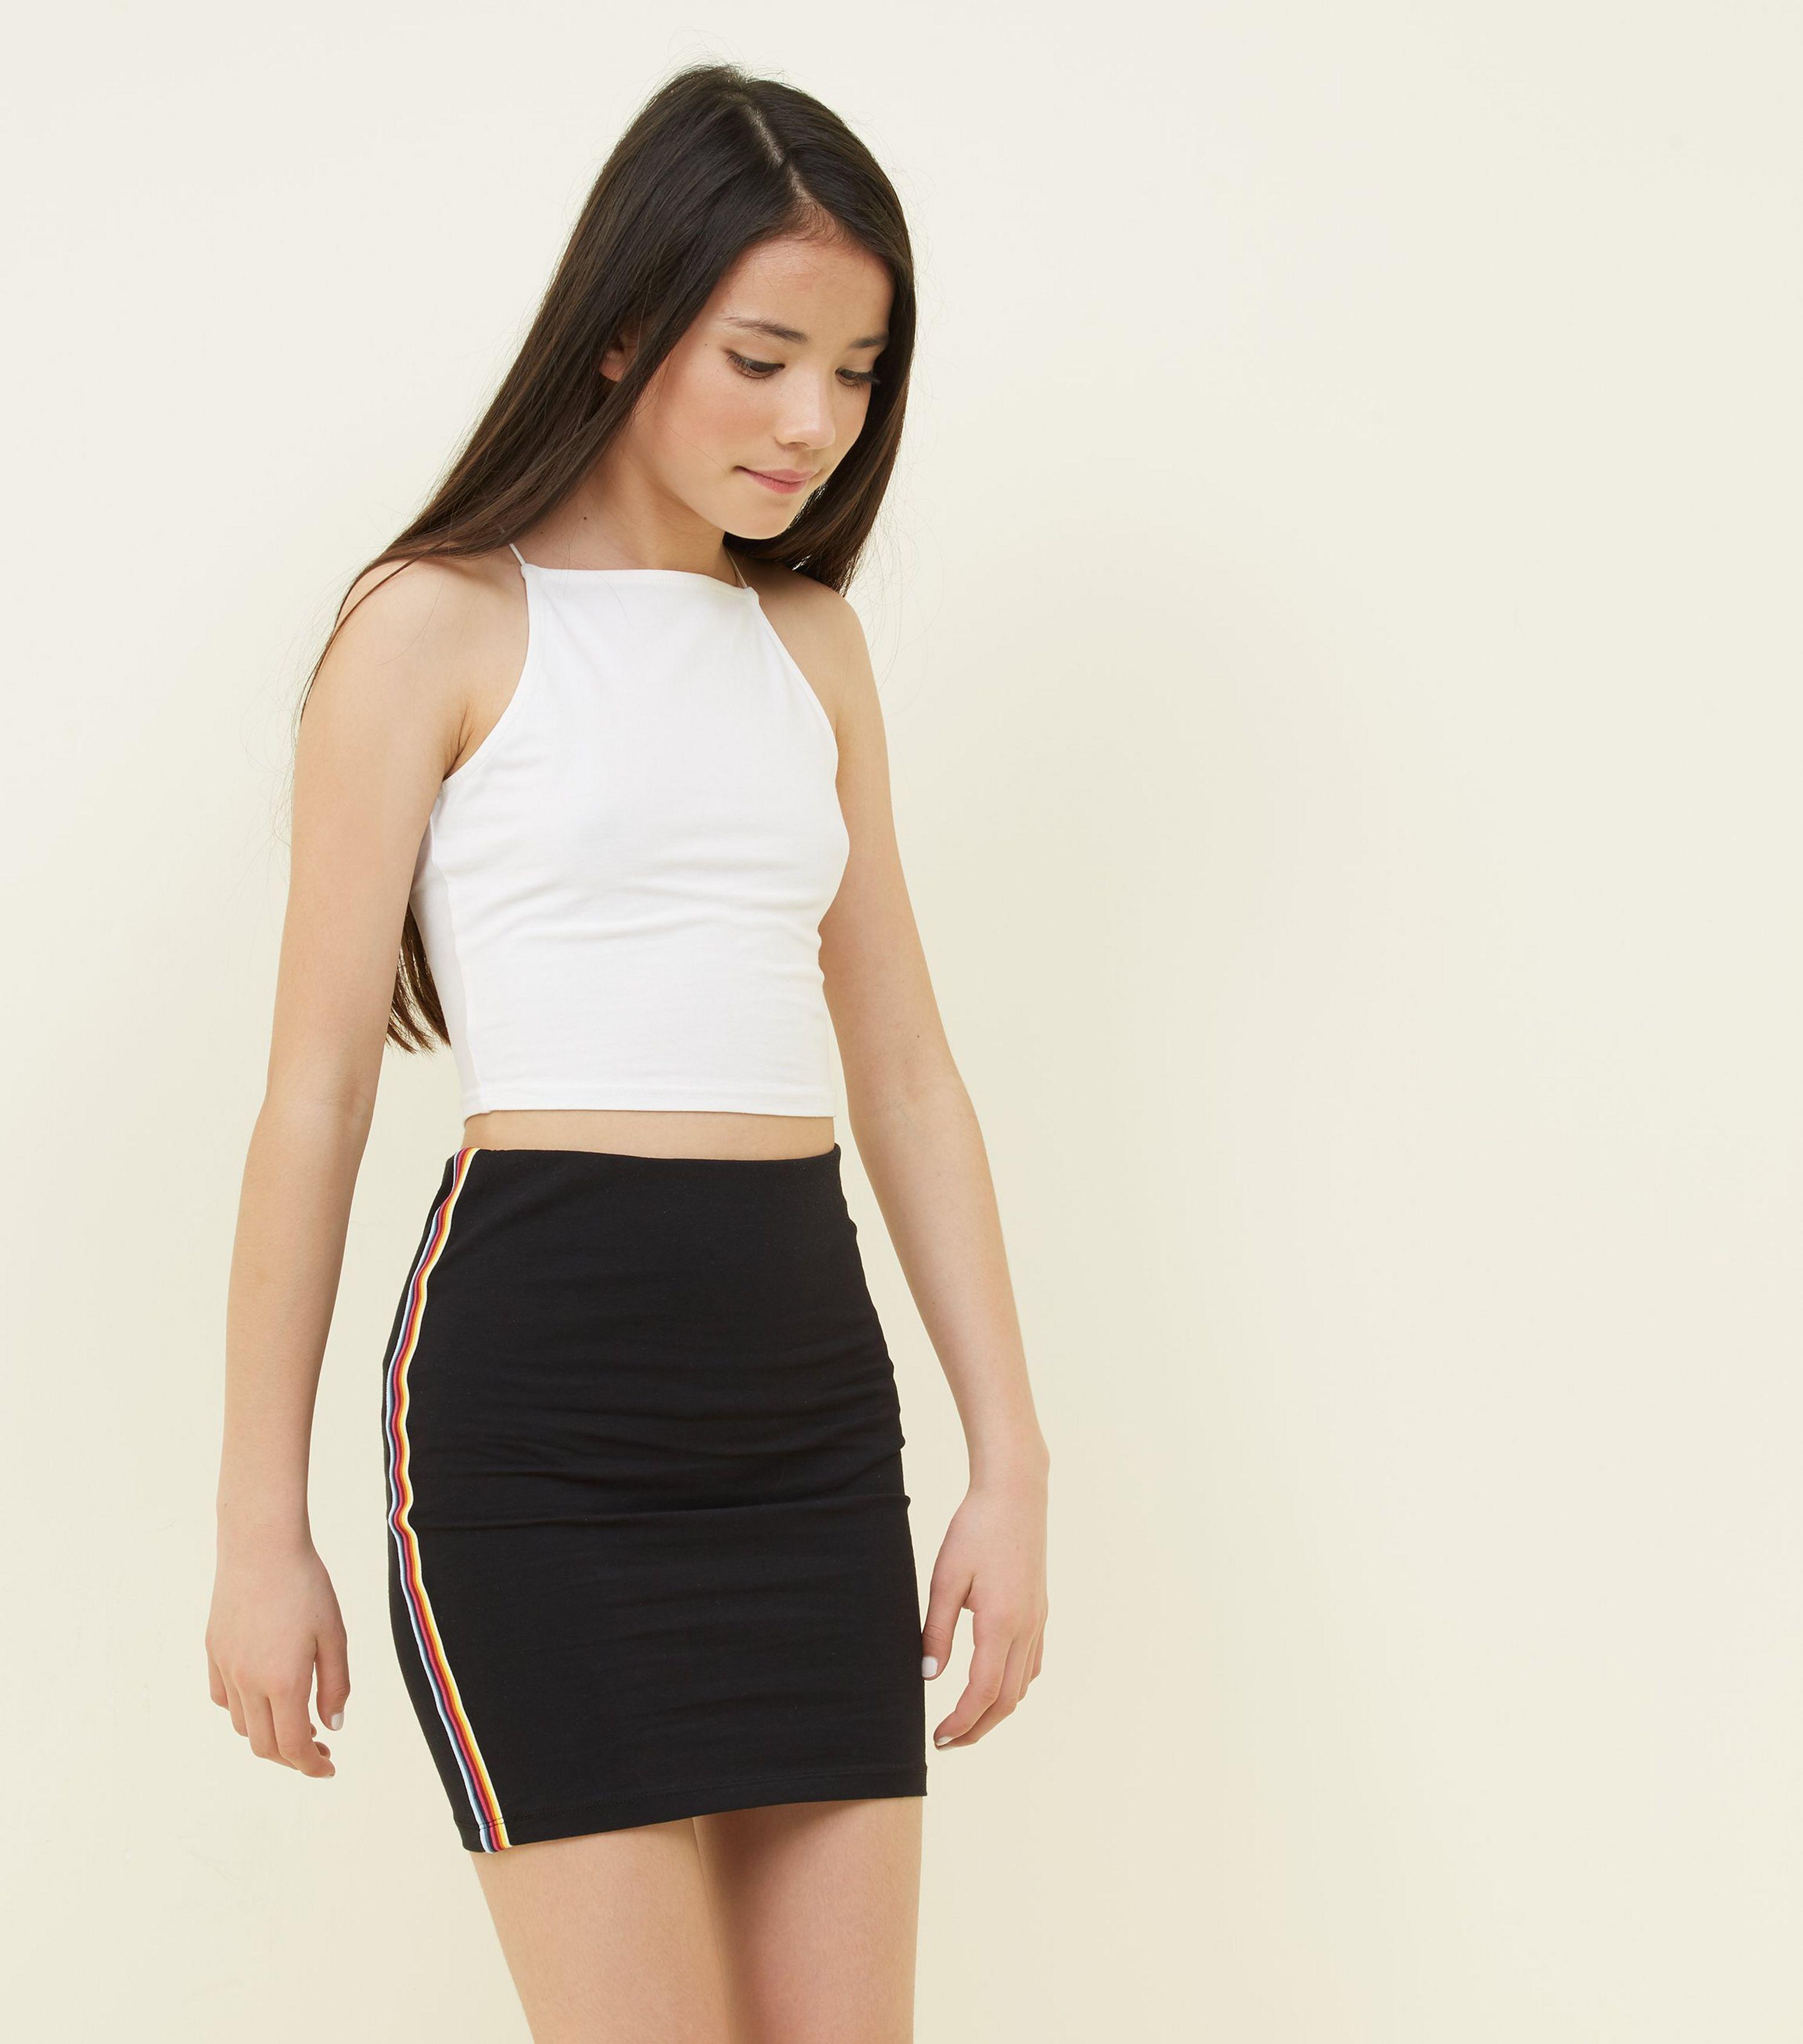 7a1507b7832c New Look Girls Black Rainbow Side Stripe Tube Skirt in Black - Lyst